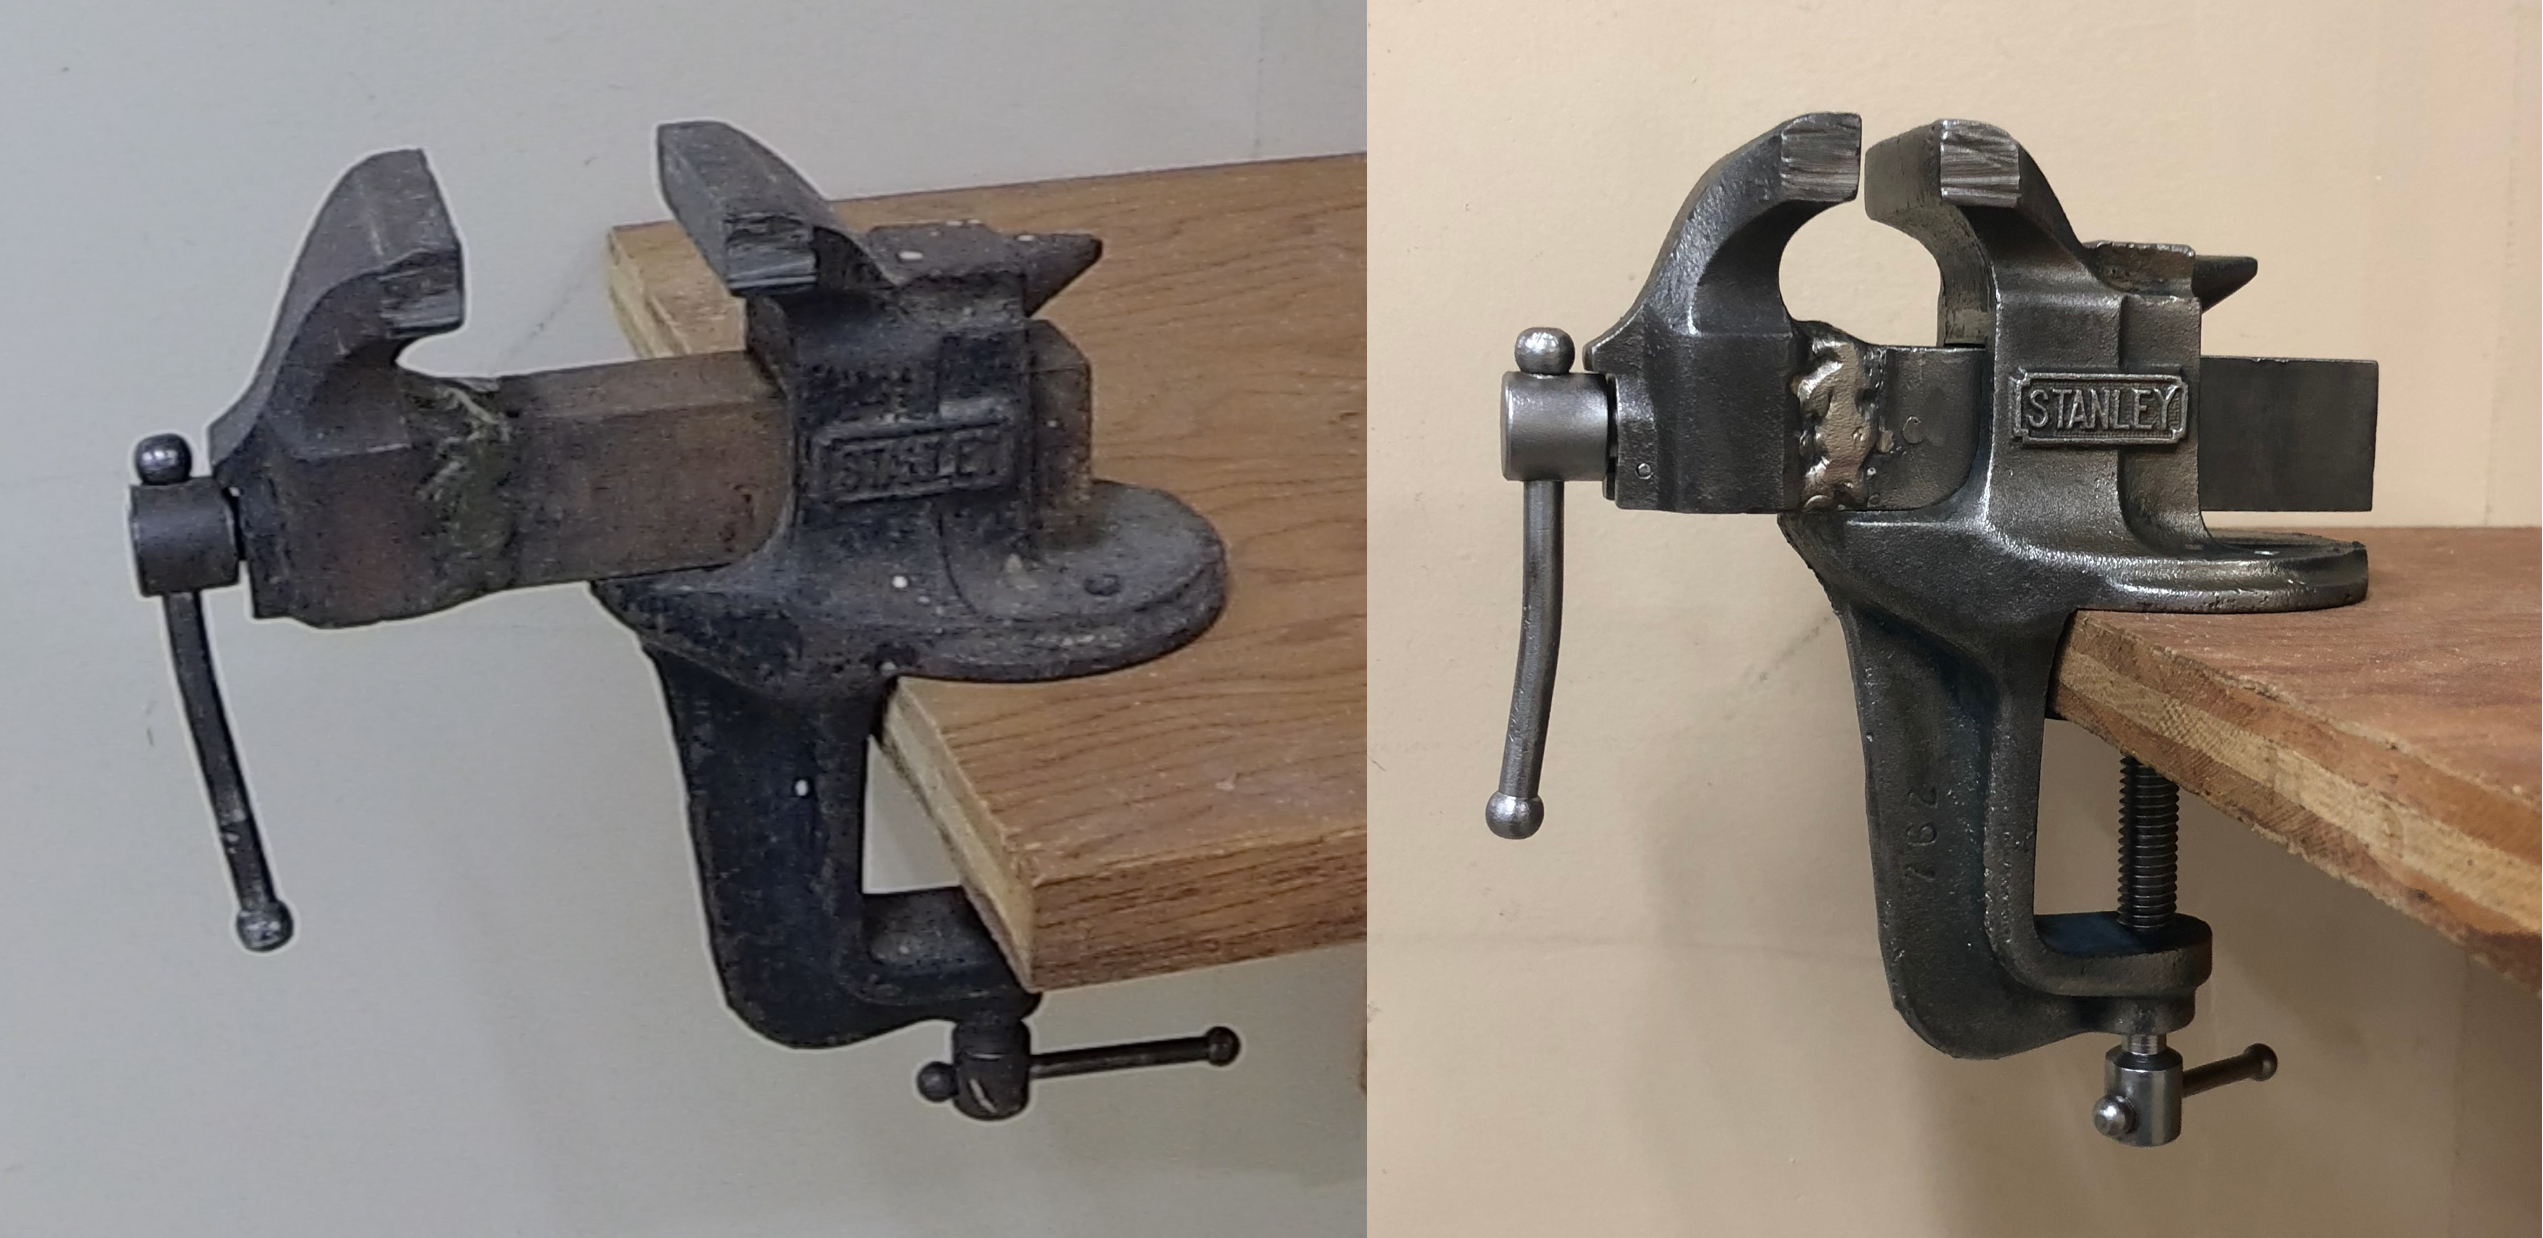 stanley-vise-restoration.jpg